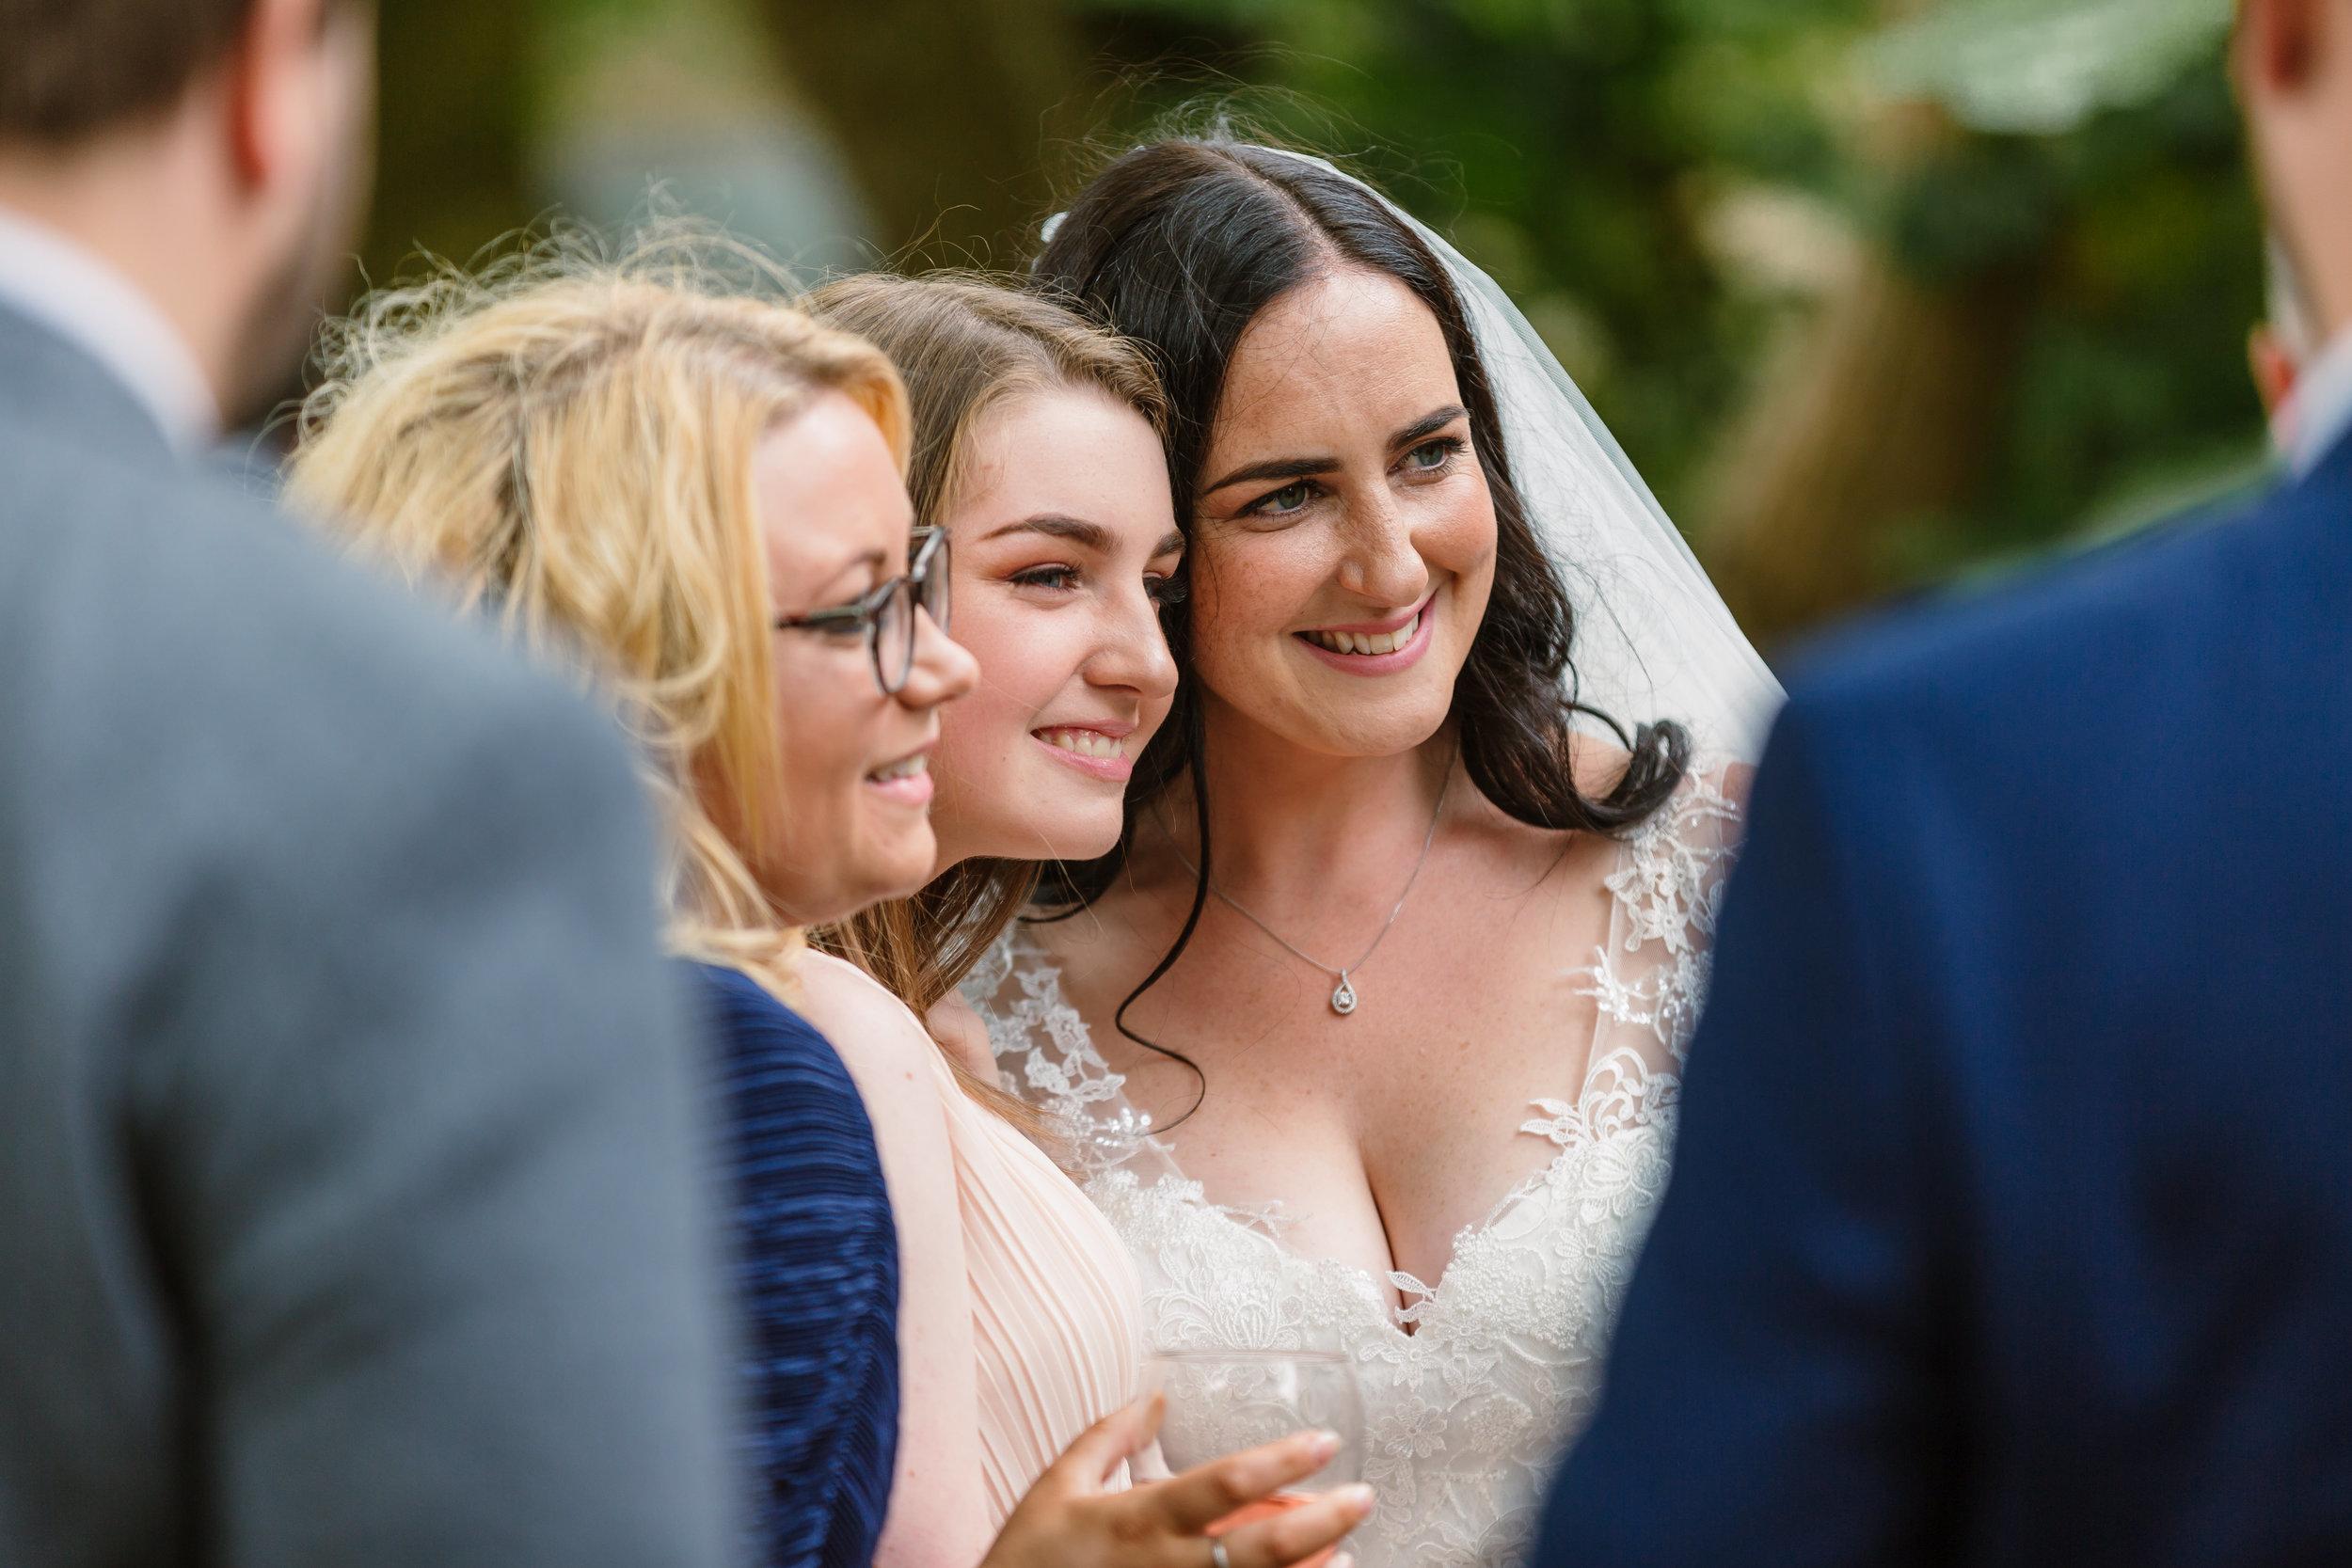 Sarah-Fishlock-Photography : Hampshire-wedding-photographer-hampshire : fleet-wedding-photographer-fleet : Meade-Hall-Wedding-Photographer : Meade-Hall-Wedding-Photos-649.jpg